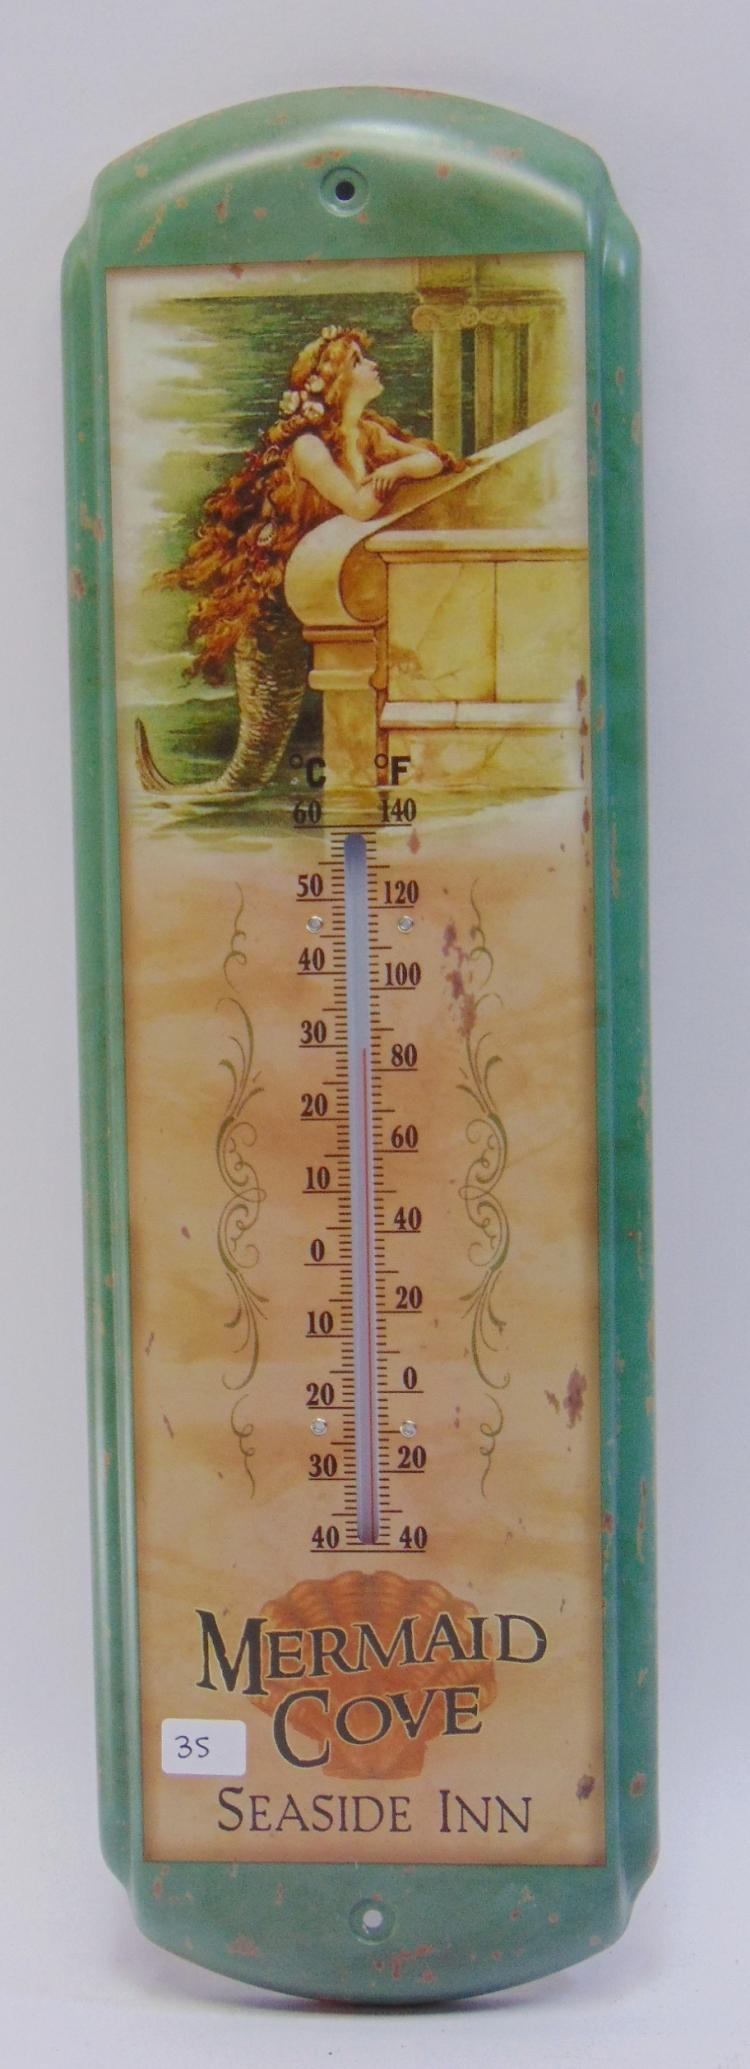 Lot 35: Mermaid Cove Seaside Inn Tin Thermometer